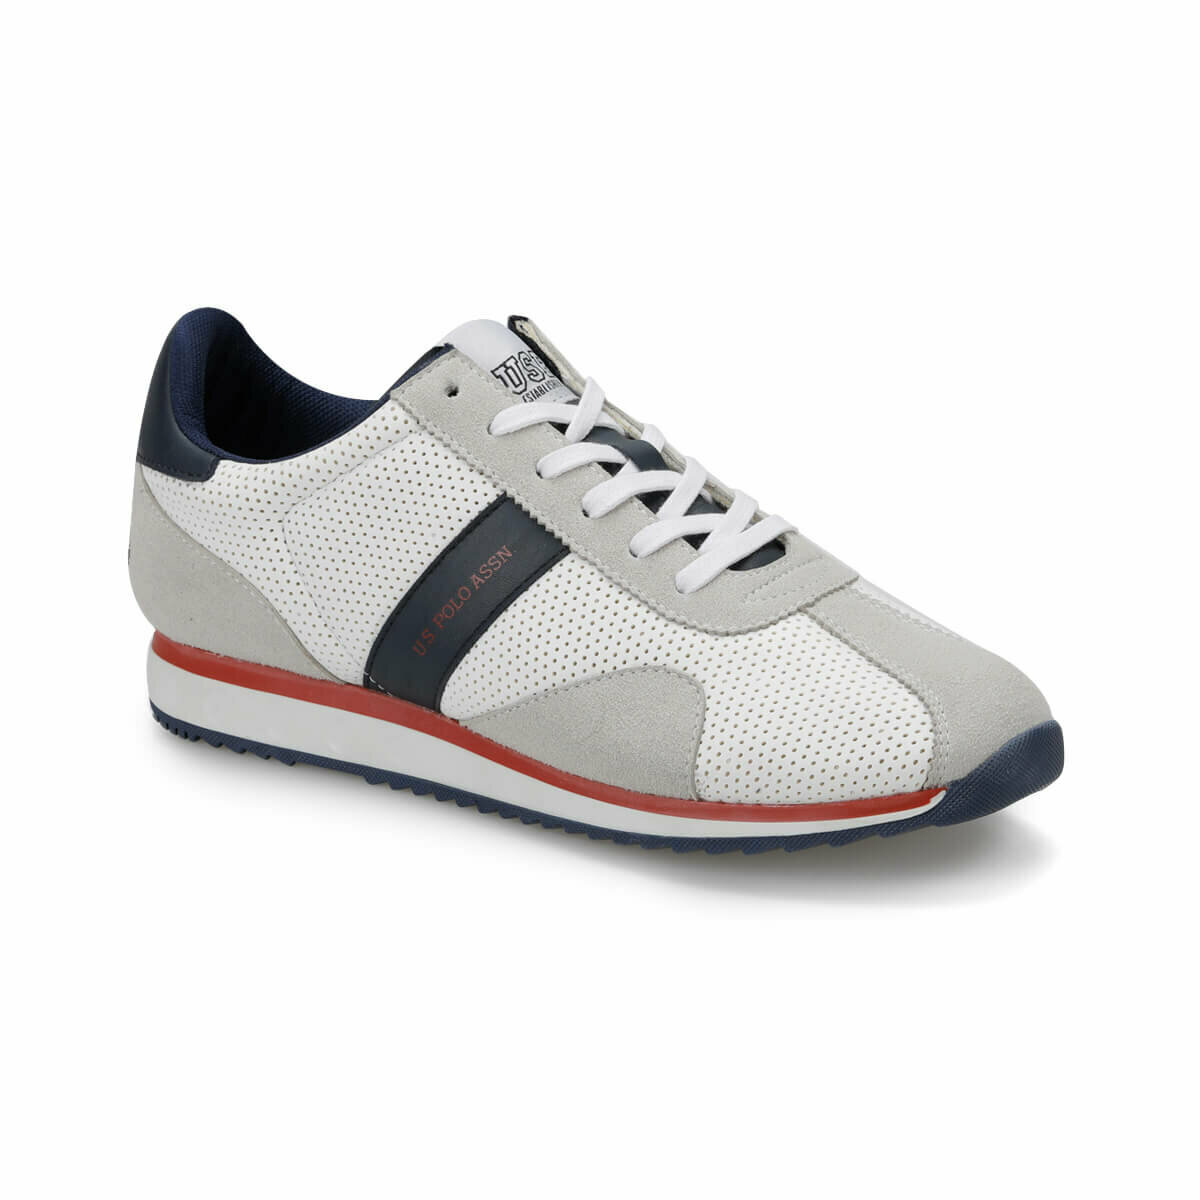 FLO LEWAN White Male Shoes U.S. POLO ASSN.